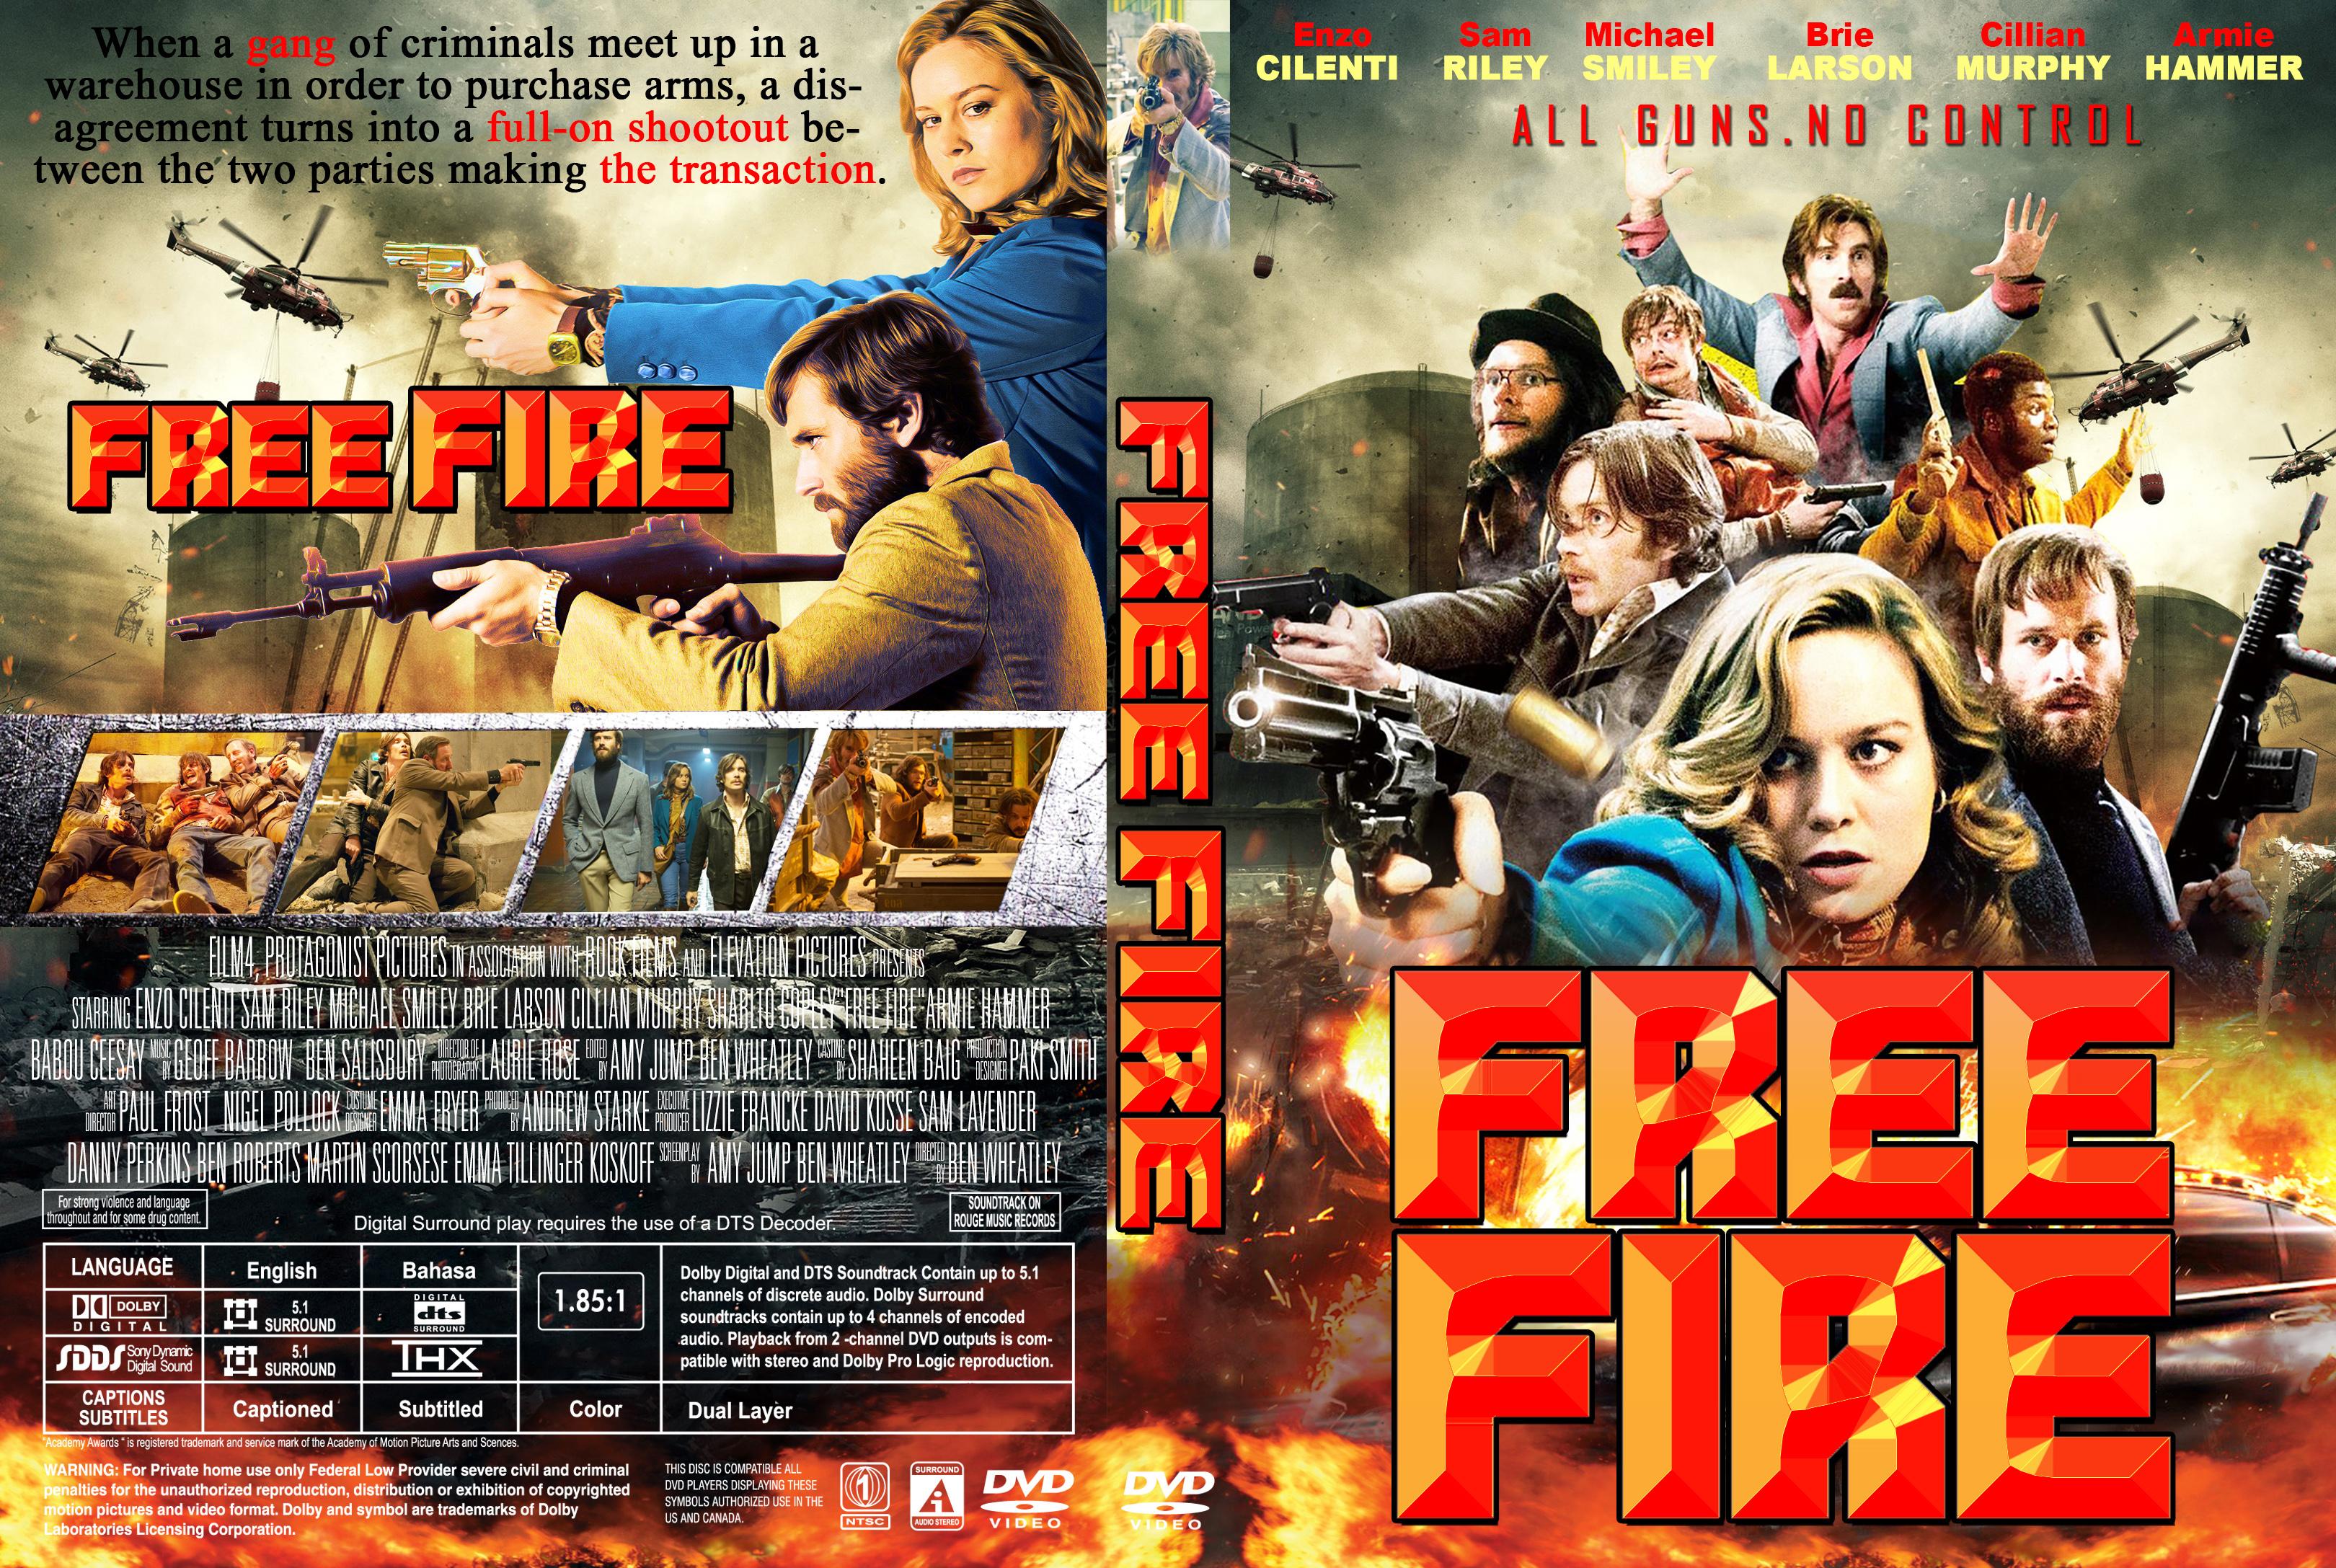 free fire movie english subtitles